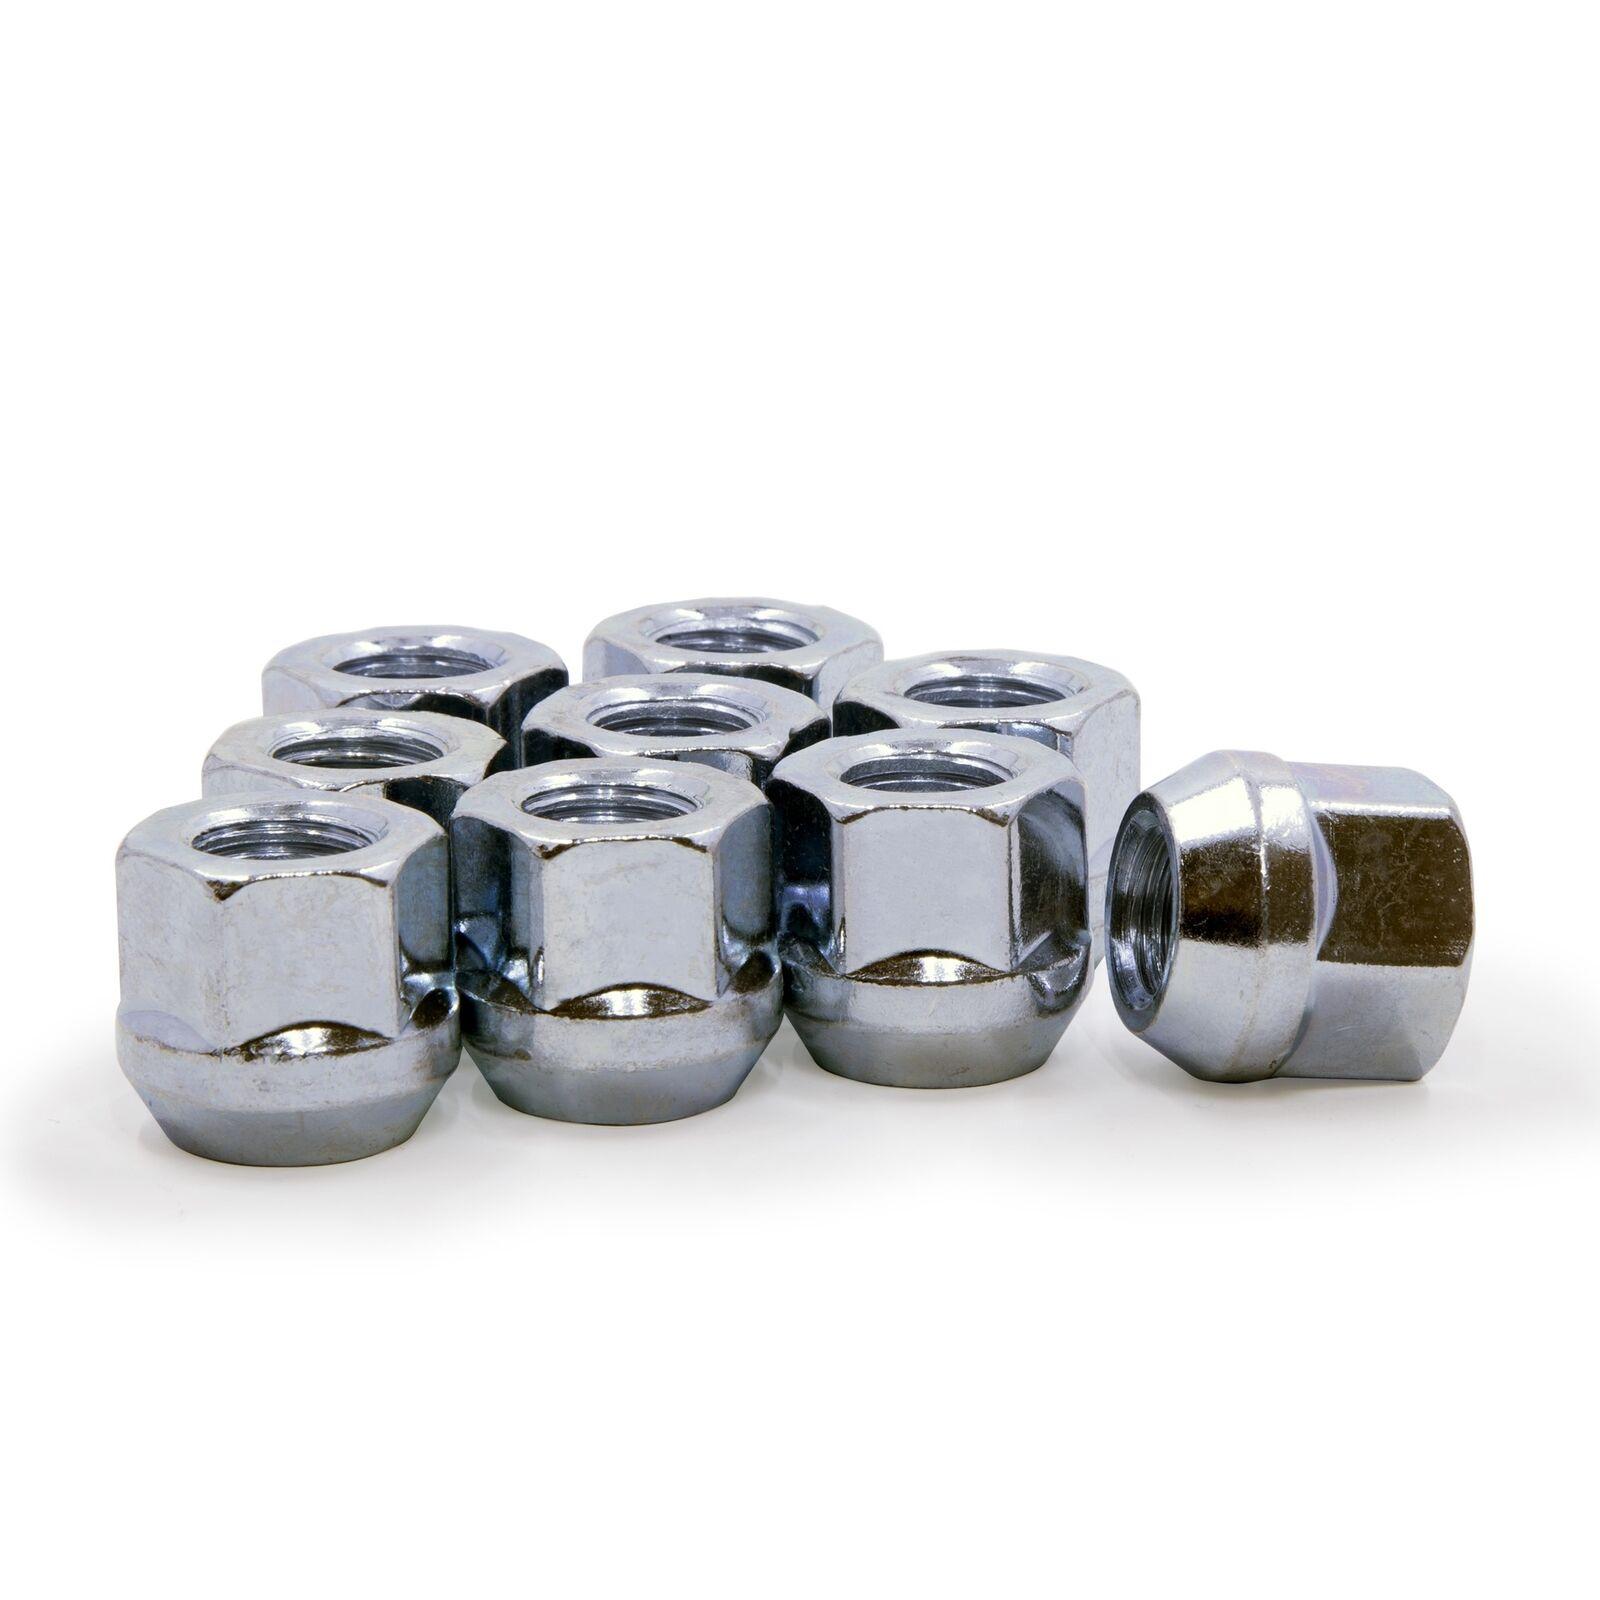 "1 Lug Nut Bulge Acorn 12x1.5 Chrome Wheel Nuts 3//4/"" Hex"